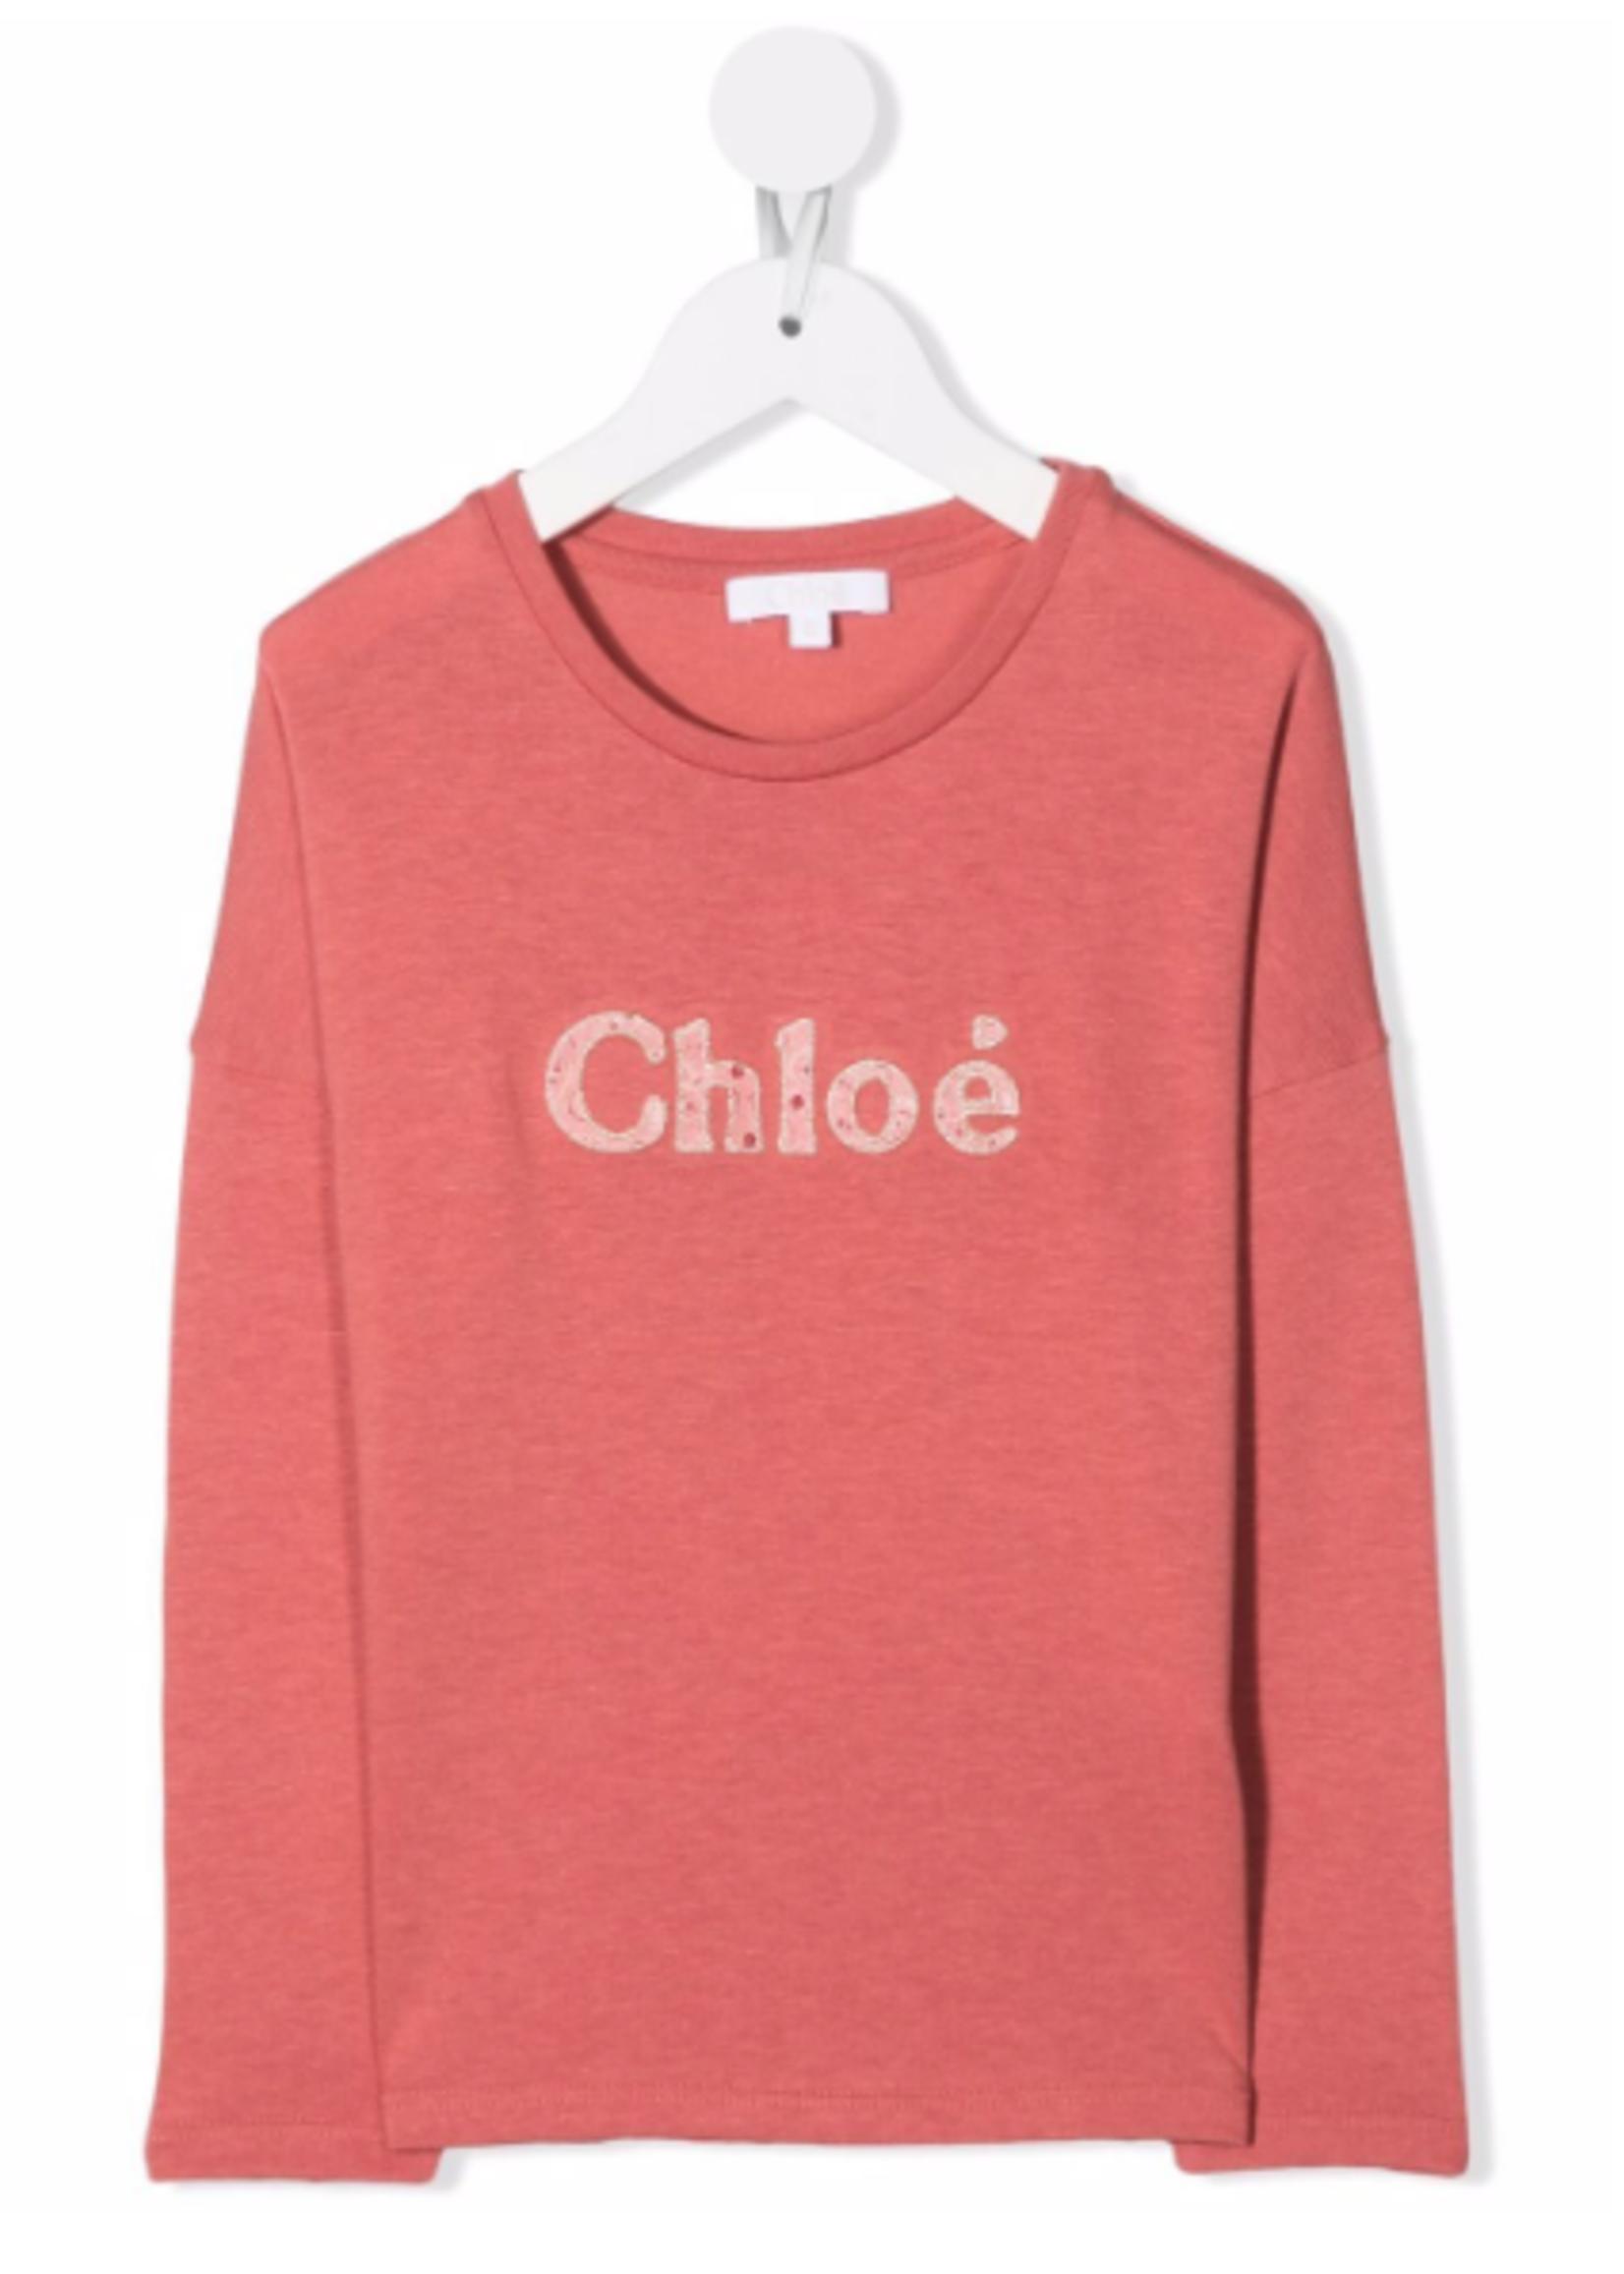 Chloe Chloe-AW21 C15D21 TEE